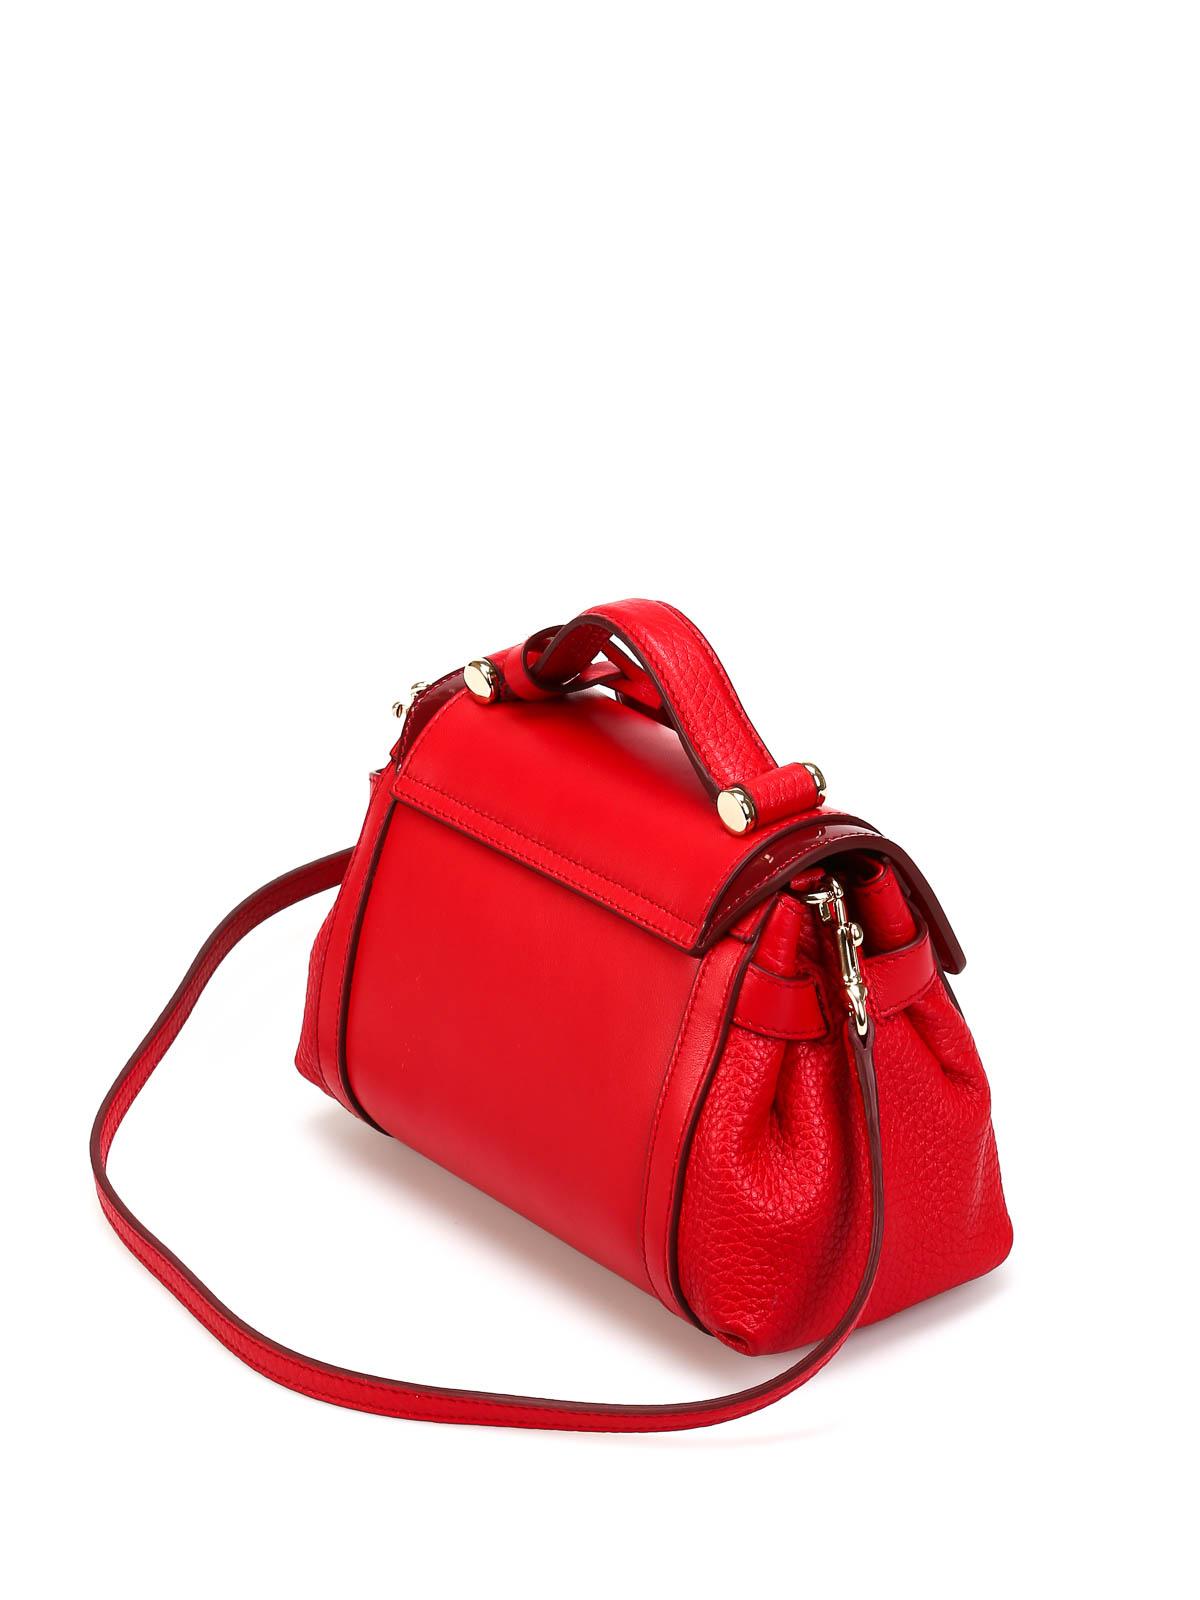 deffb793003bb1 Red Leather Cross Body Handbag | Stanford Center for Opportunity ...